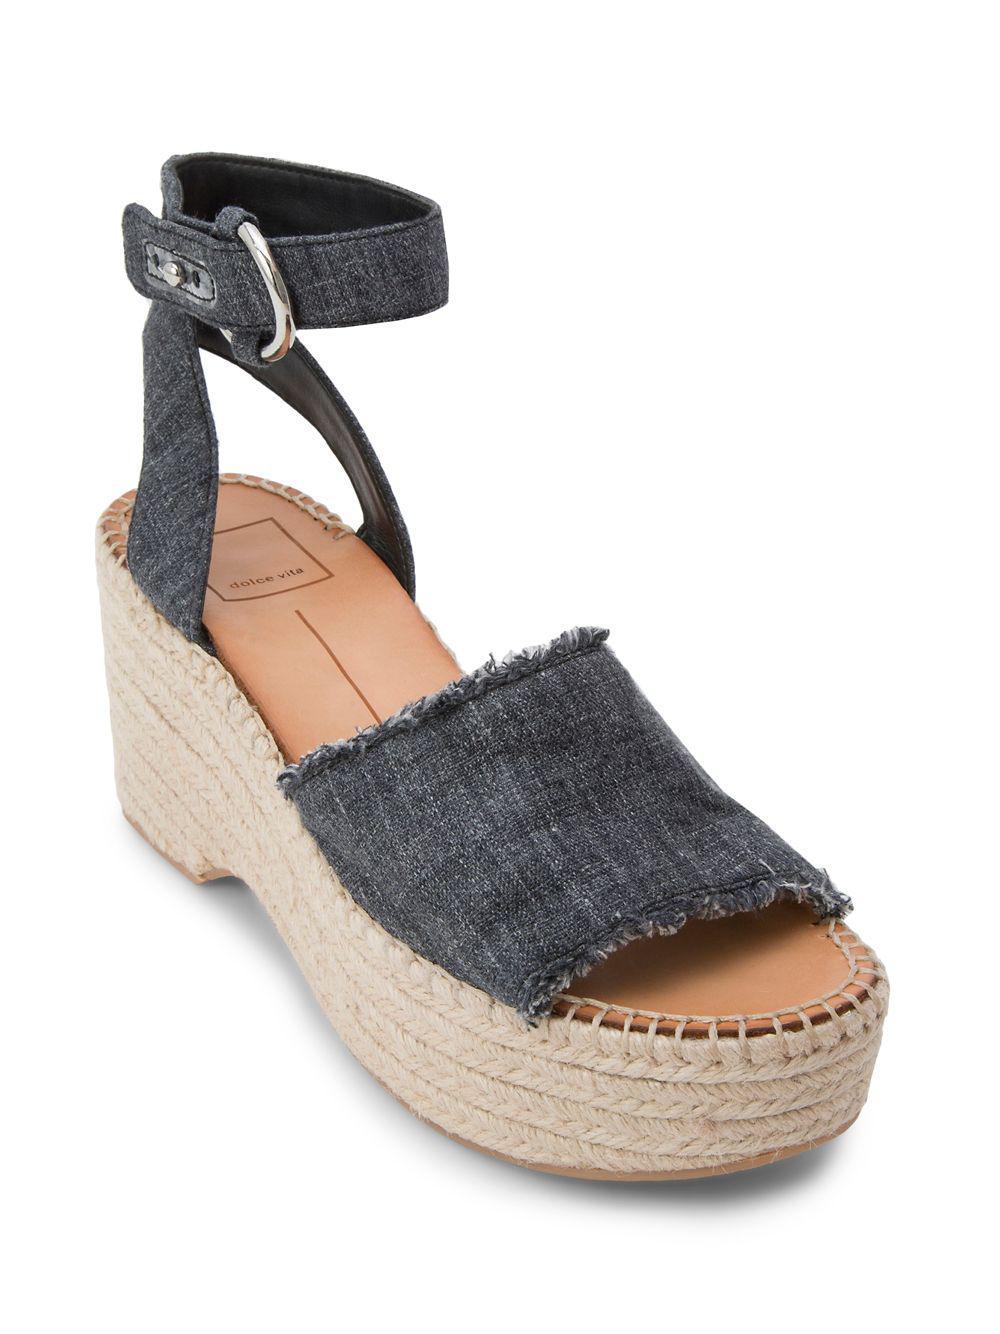 Dolce Vita Lesly Linen Platform Espadrille Sandals bYsFkBrW